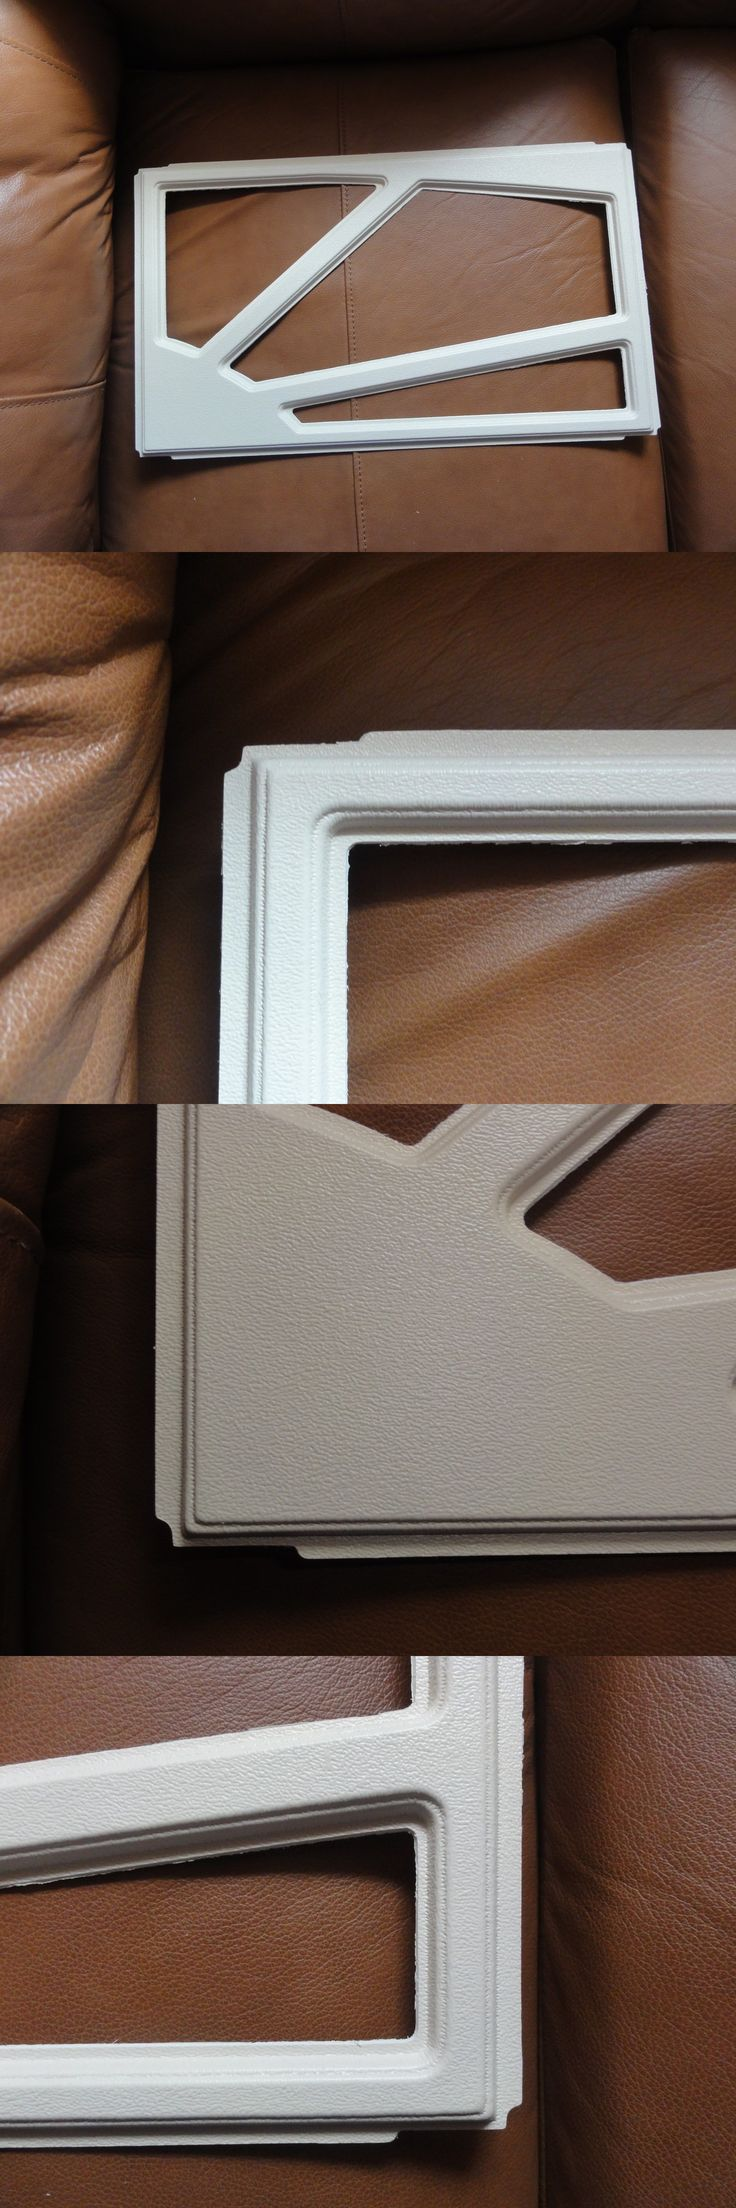 Round top front door window inserts - Garage Door Parts And Accs 179687 Garage Door Window Clopay Window Insert Panel Sunset 18